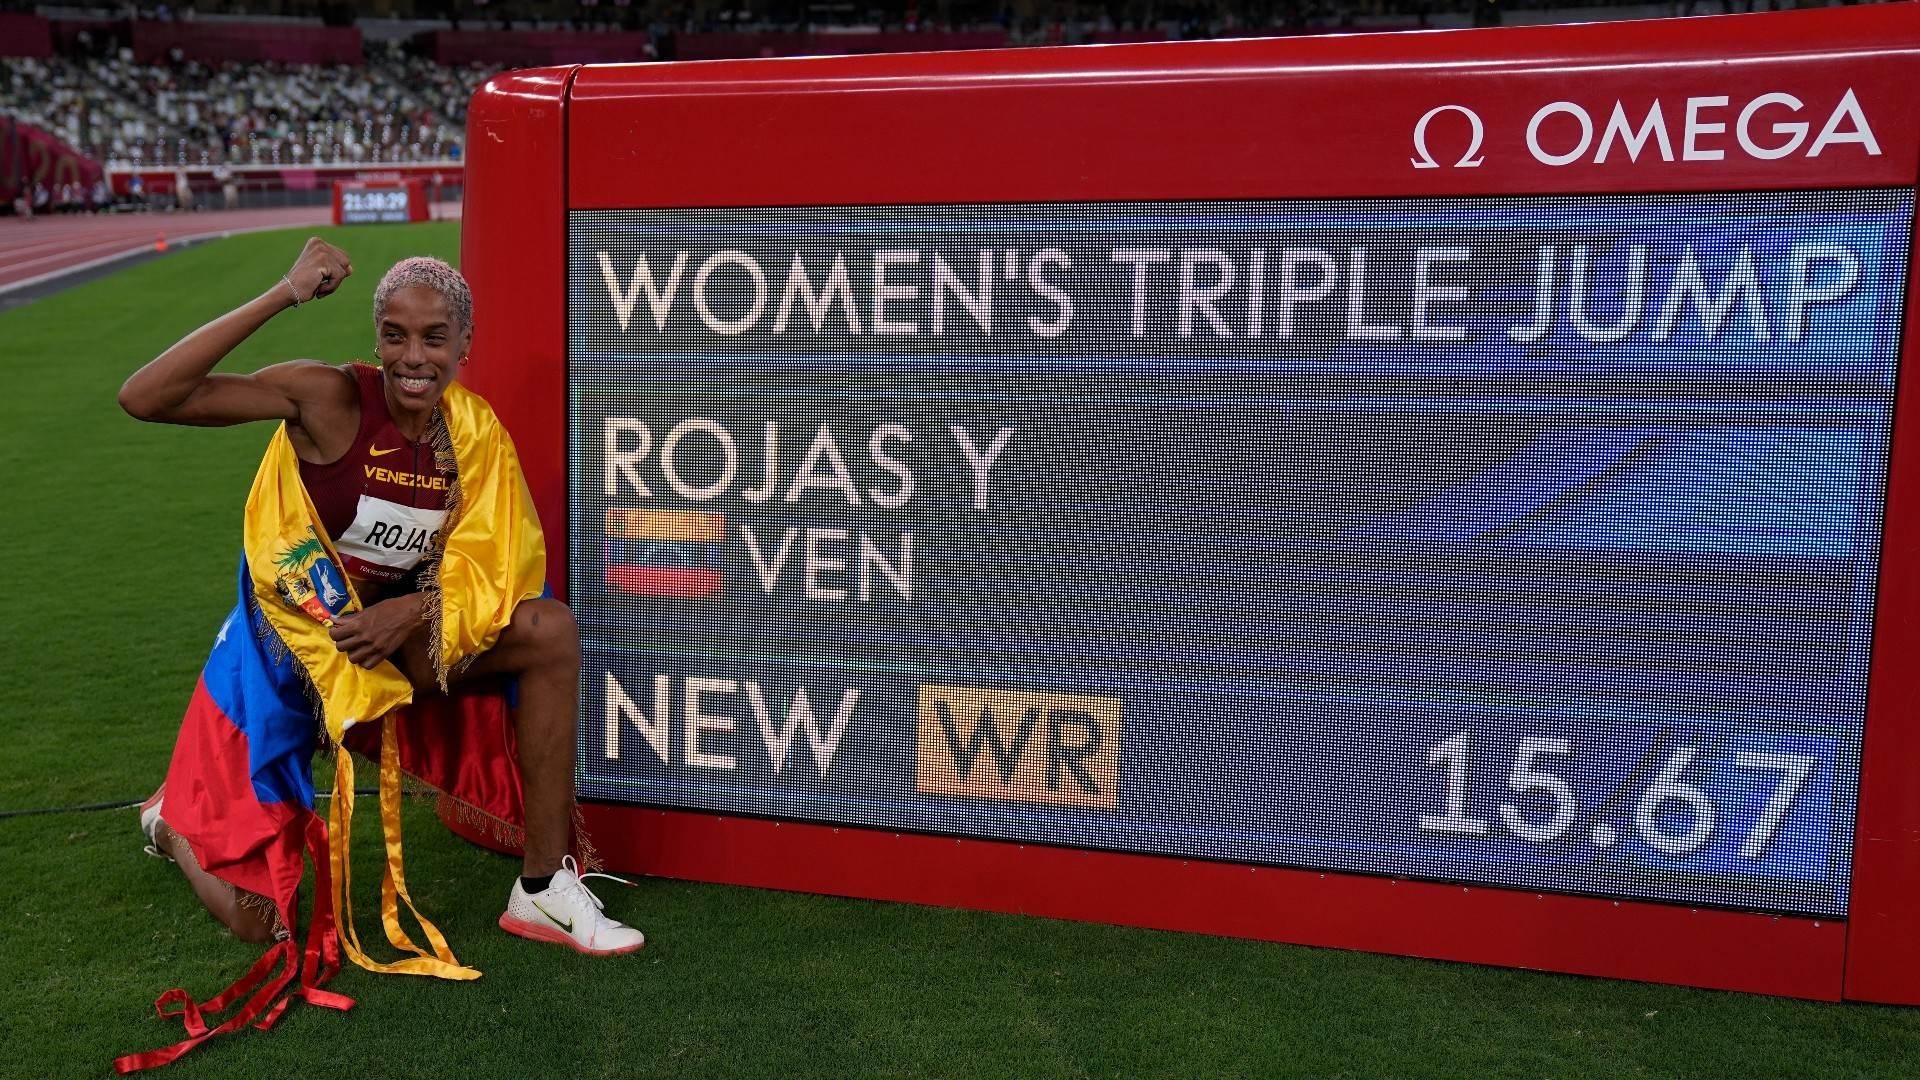 Venezuelana Yulimar Rojas quebrou recorde mundial do salto triplo, com 15,67m